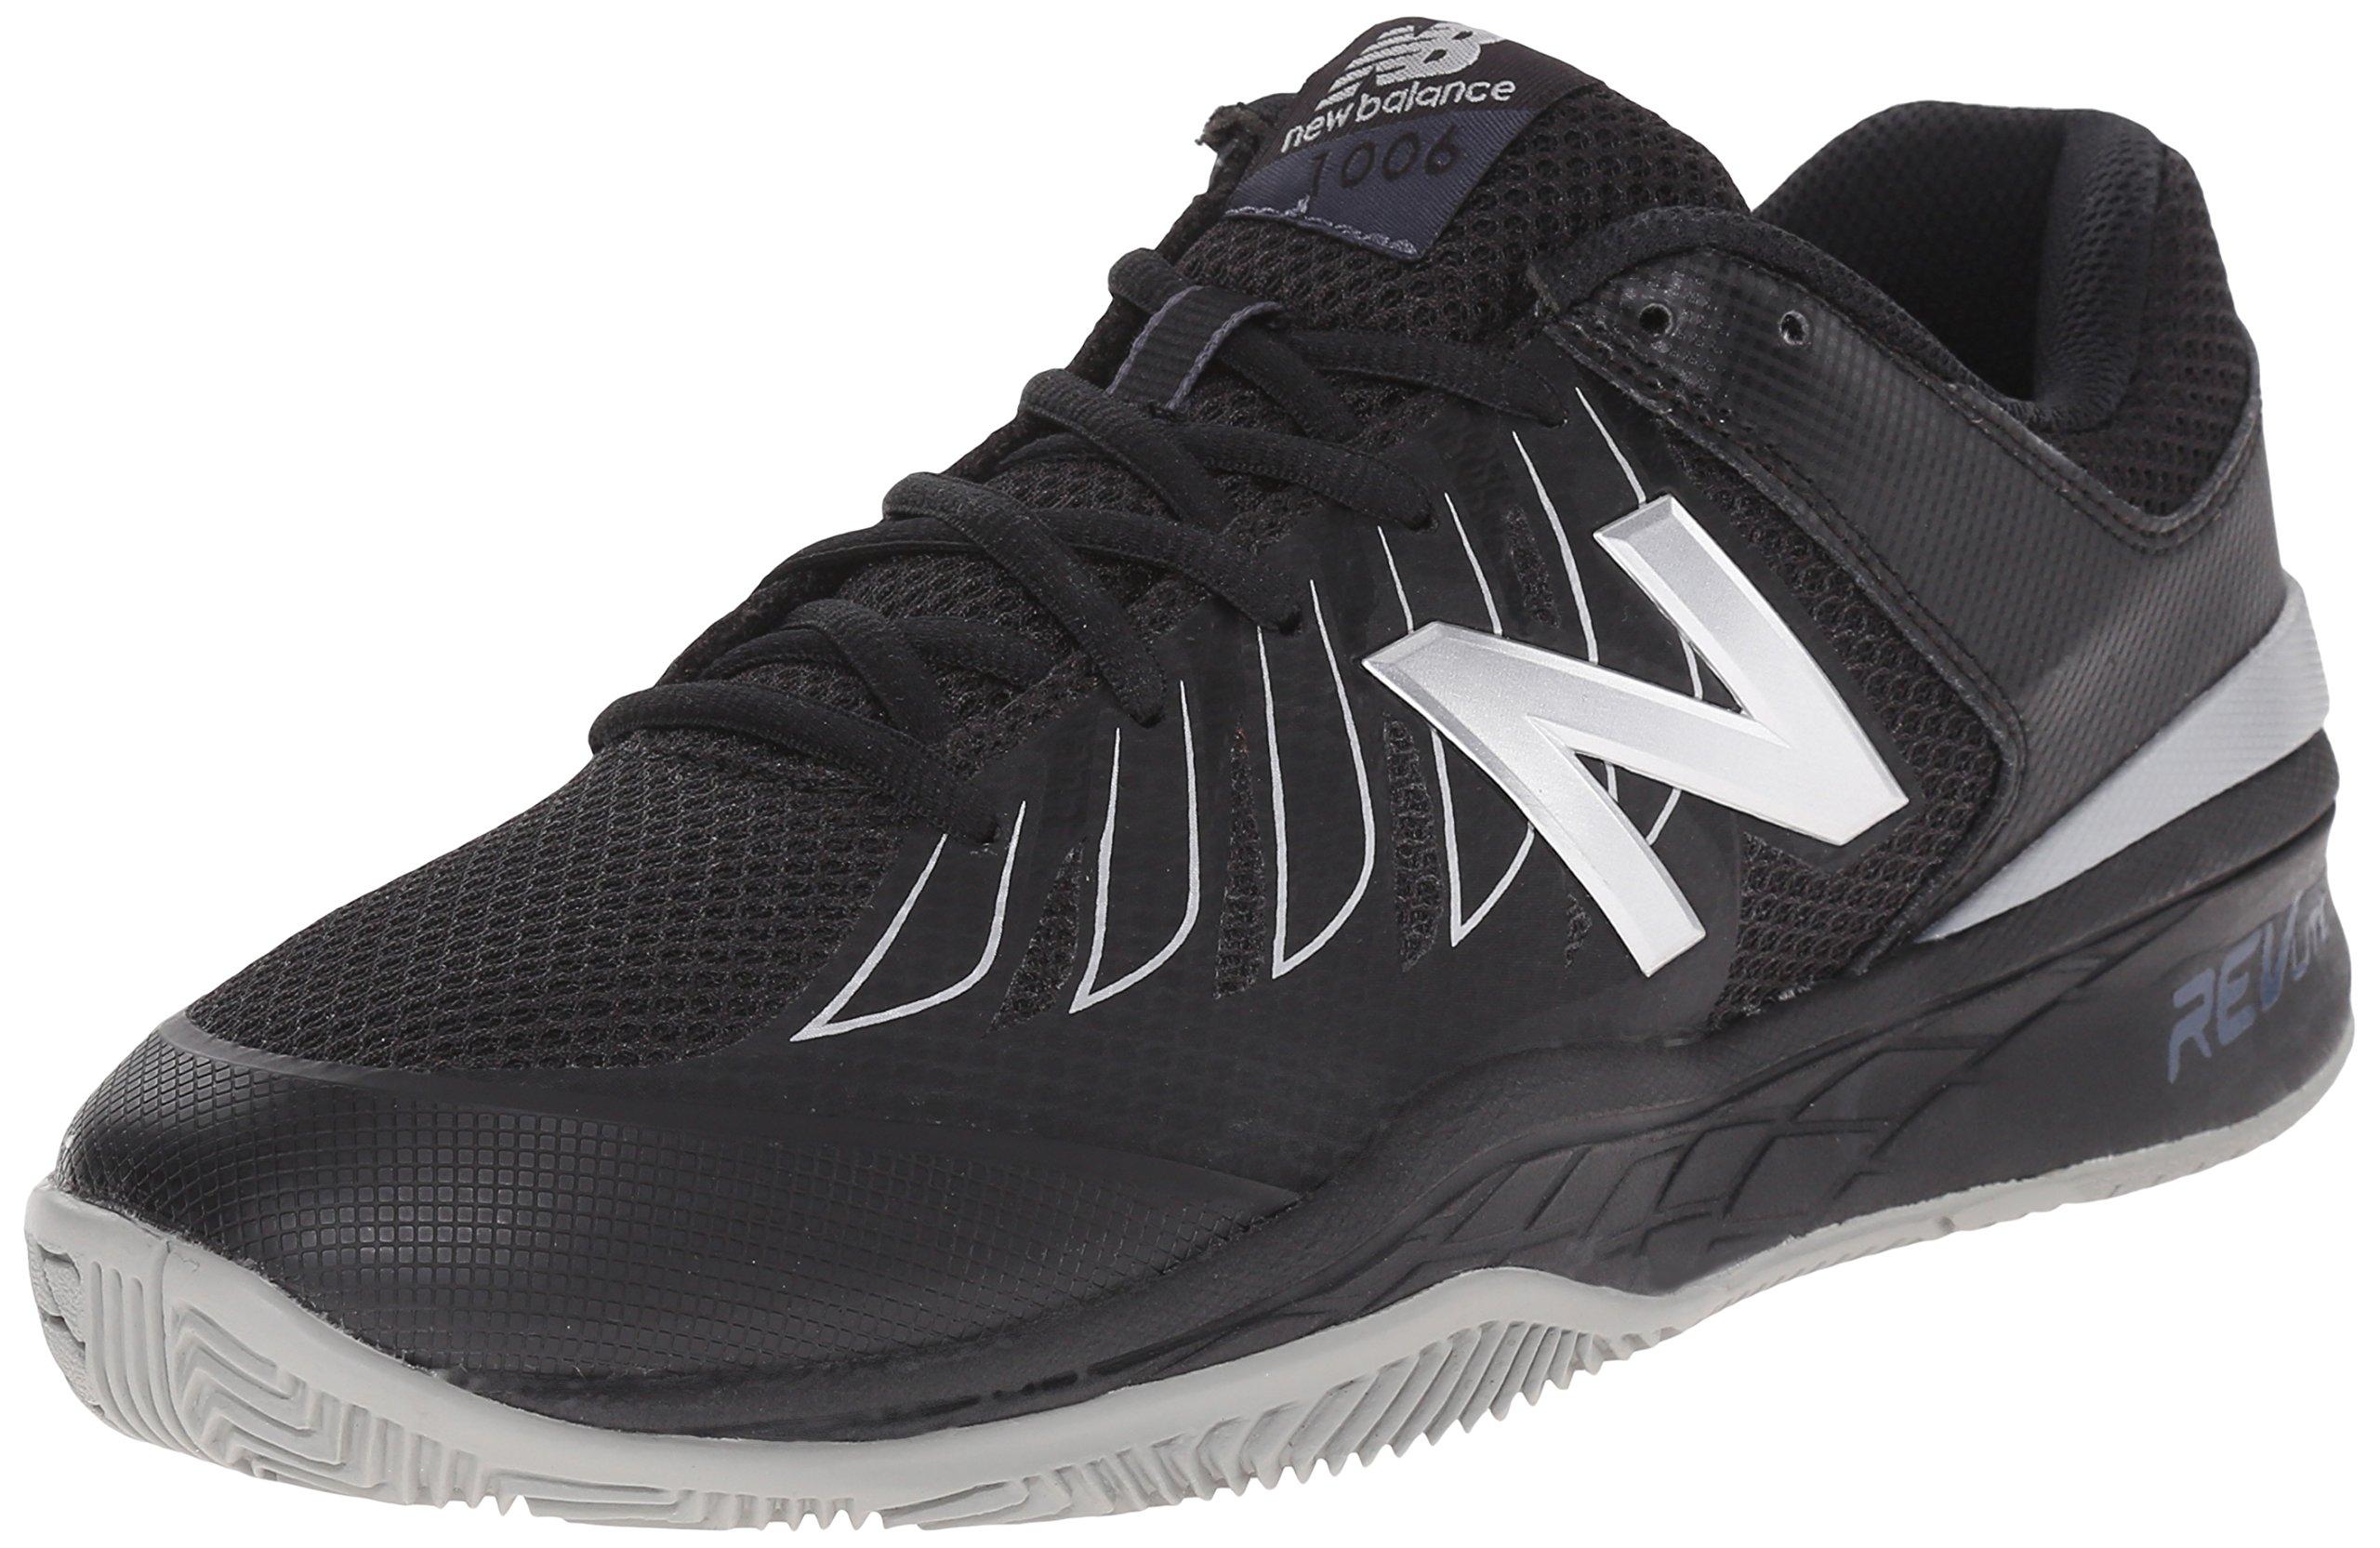 New Balance Men's MC1006V1 Black/Silver Tennis Shoe - 12 D(M) US